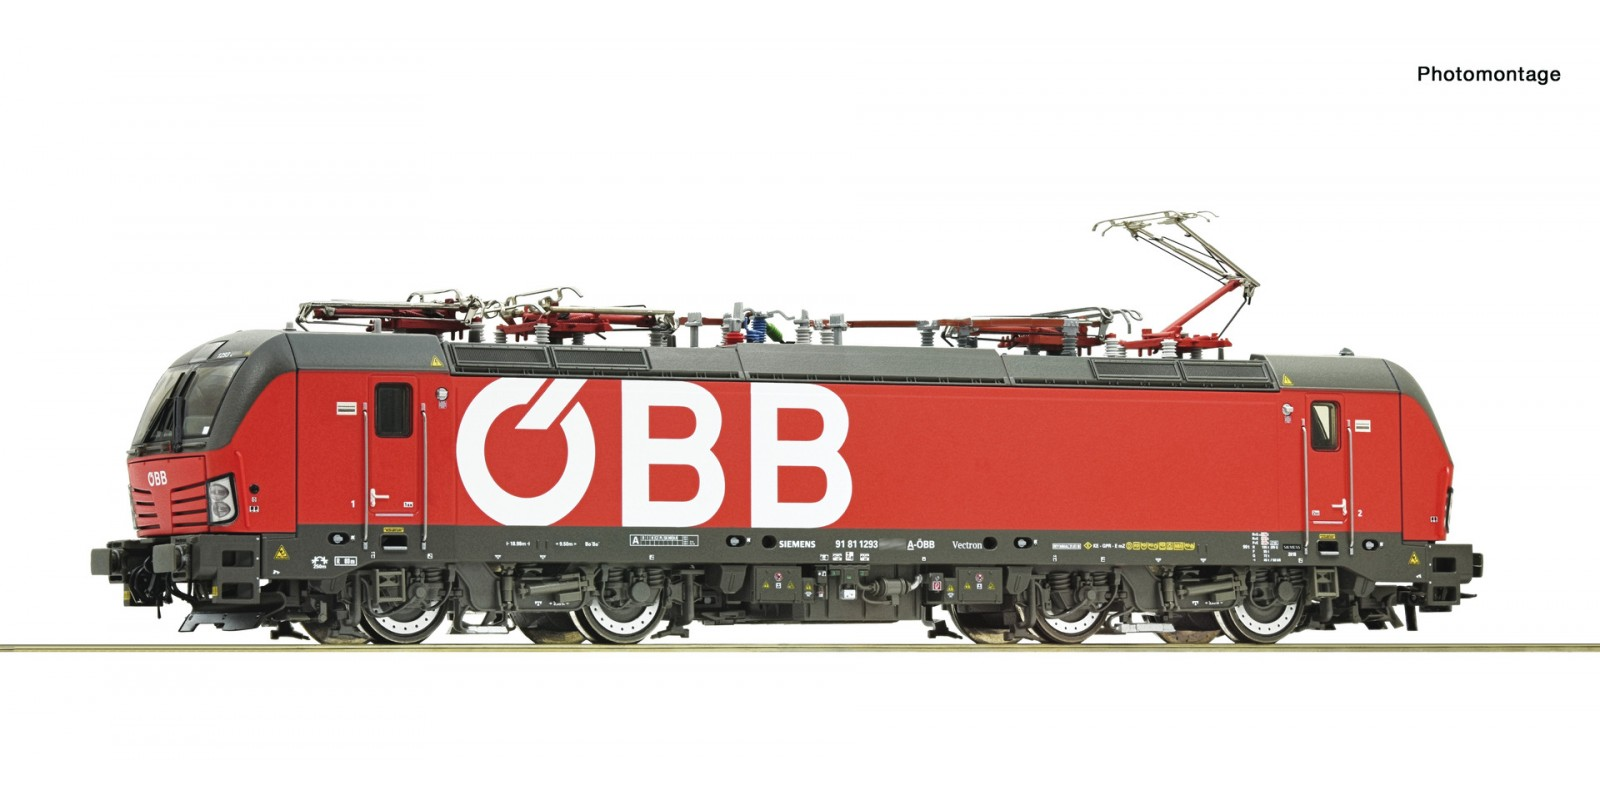 RO79959 Electric locomotive class 1293